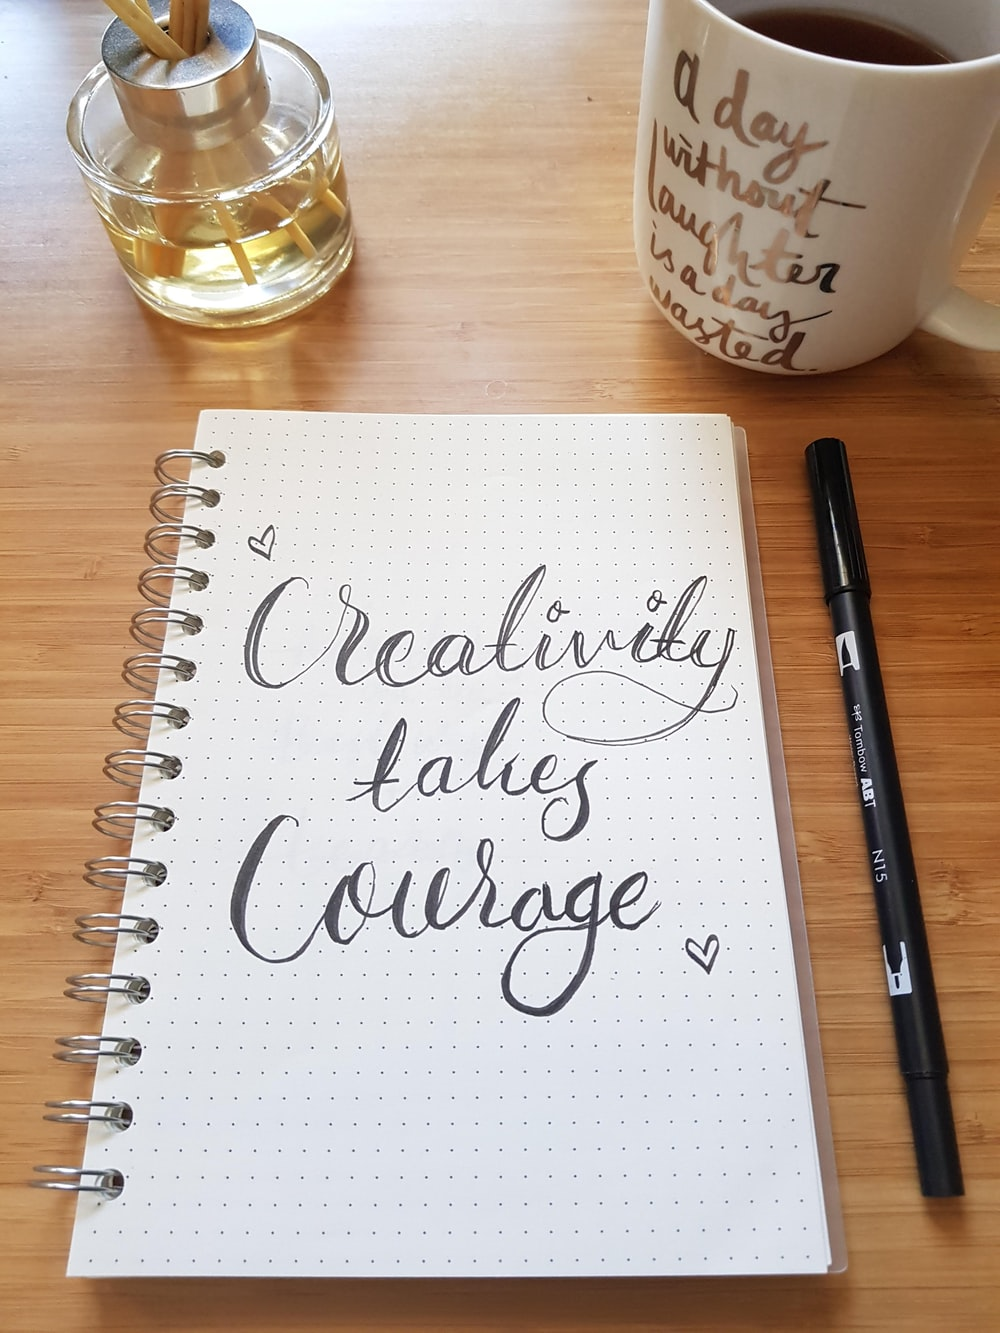 black pen beside white spiral notebook